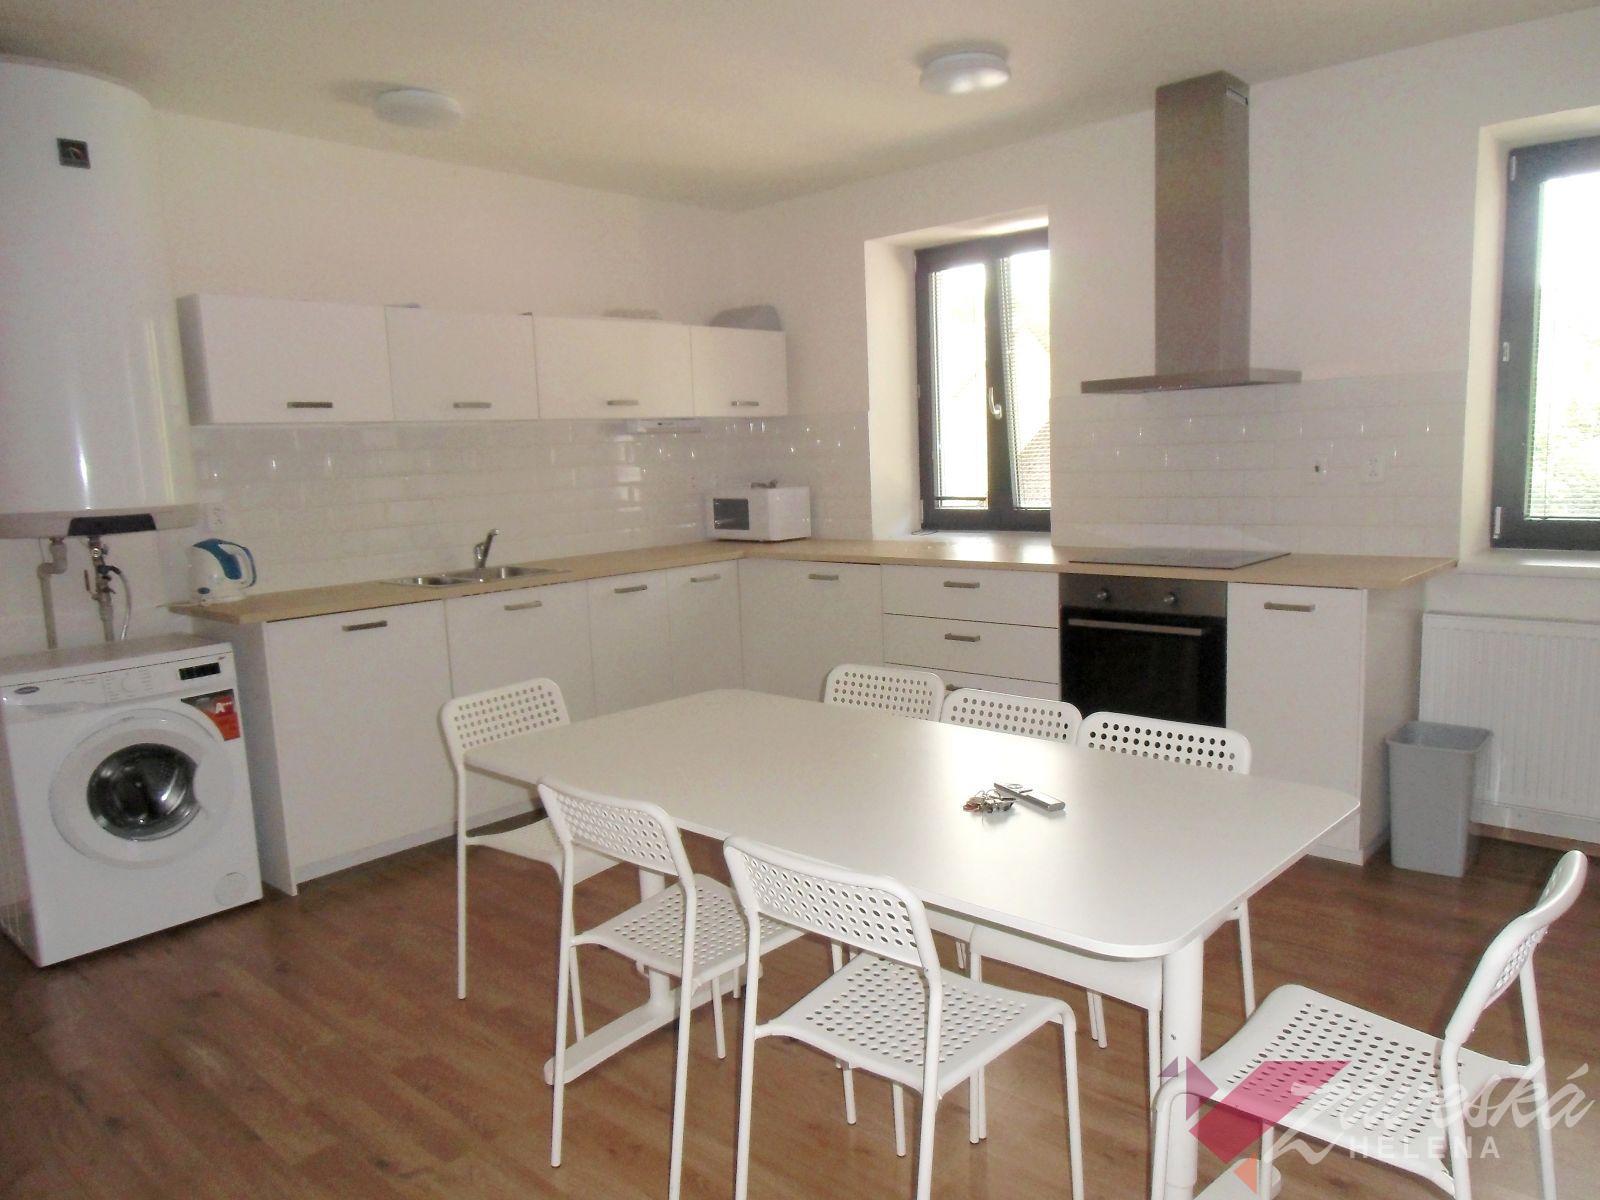 Podnájem, byt, 3+kk, 90 m2, Mladá Boleslav, Debř